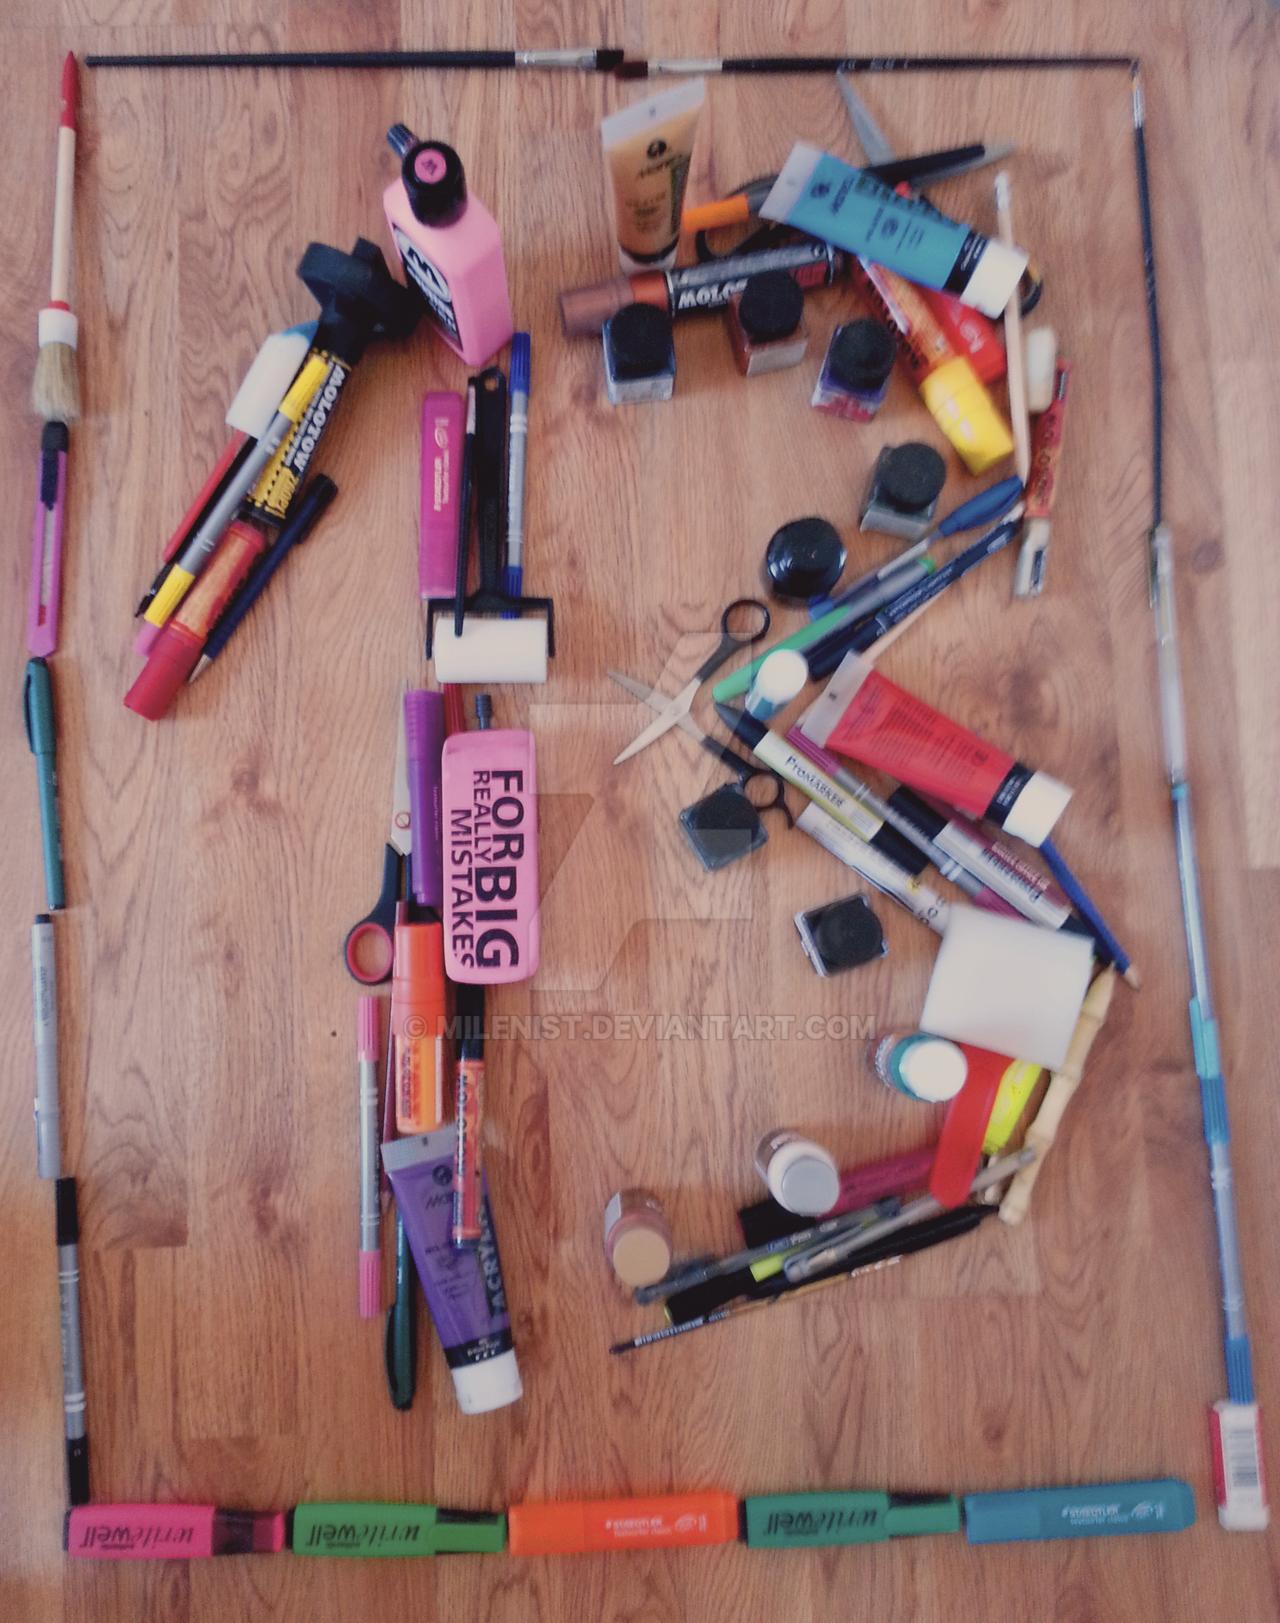 dA's Birthday - Creatively Photograph 13 Contest by Milenist